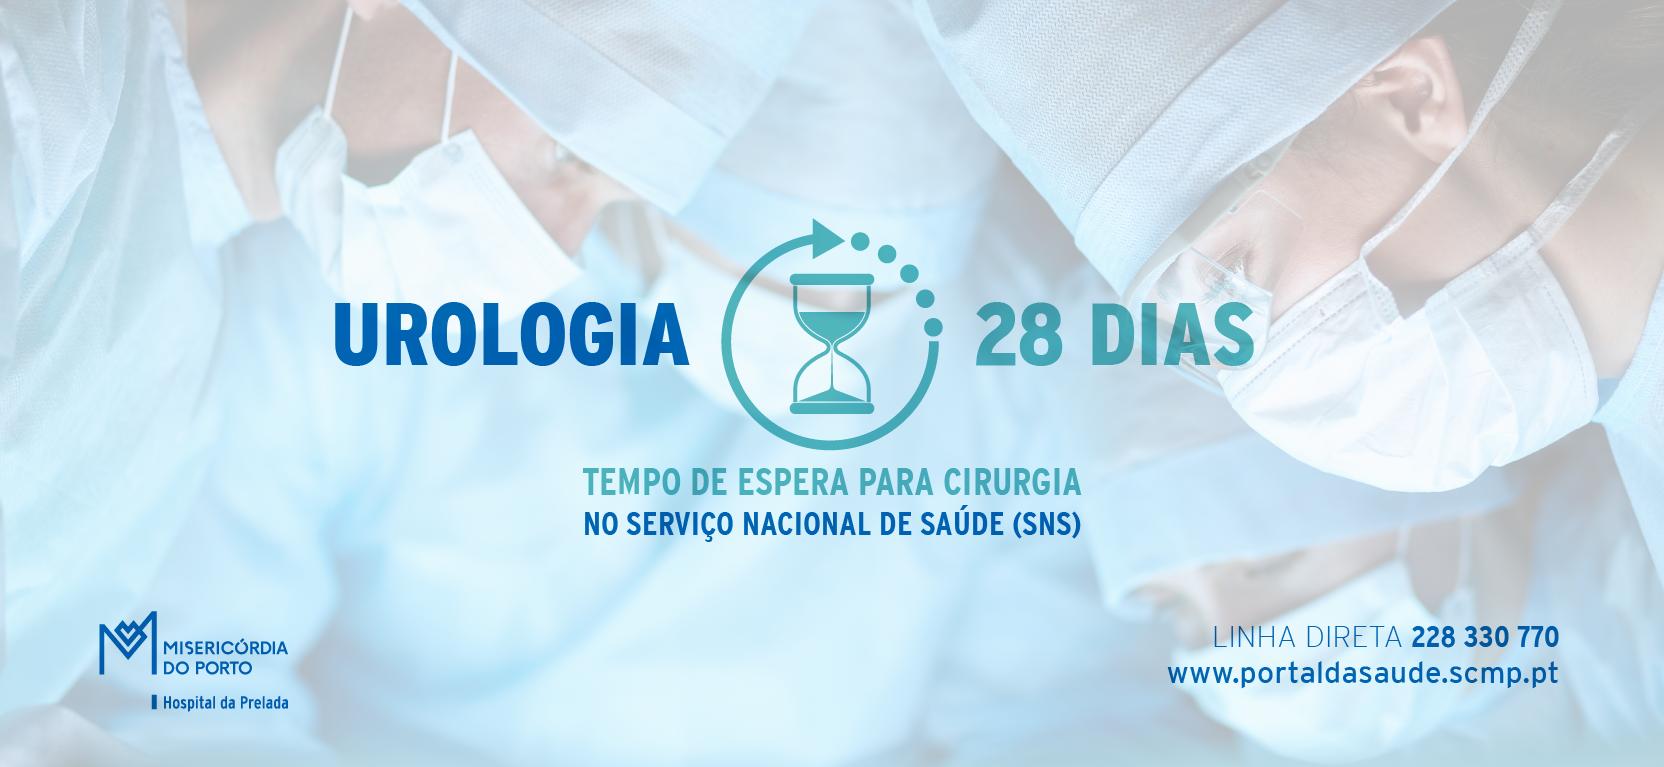 https://www.scmp.pt/assets/misc/img/2020/2020-01-31%20HP%20Noticias/HPurologia.png